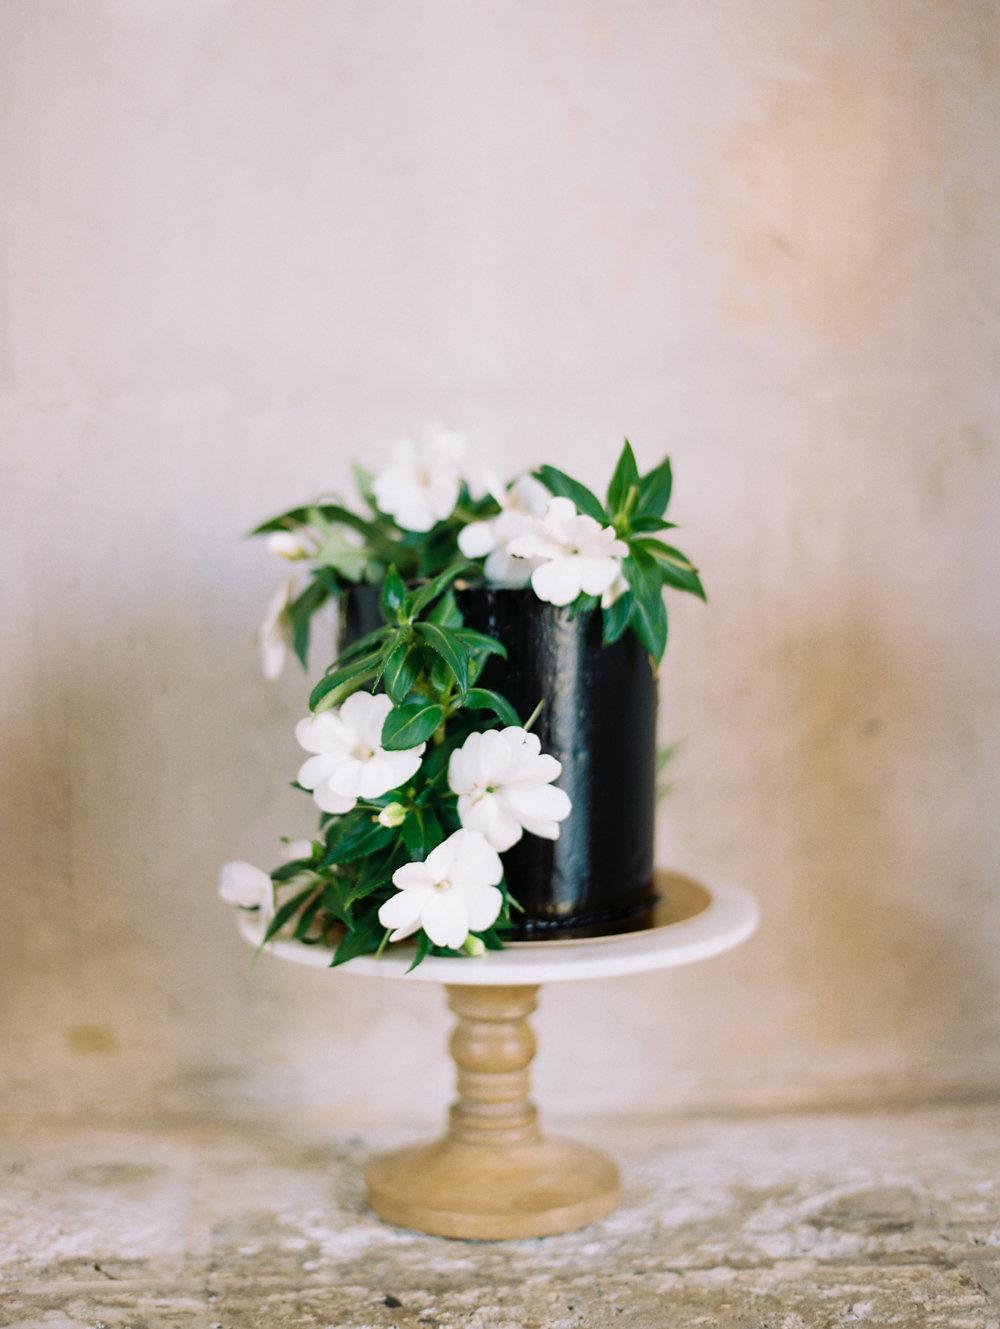 jessica-zimmerman-events-miami-wedding-cake-elope.JPG